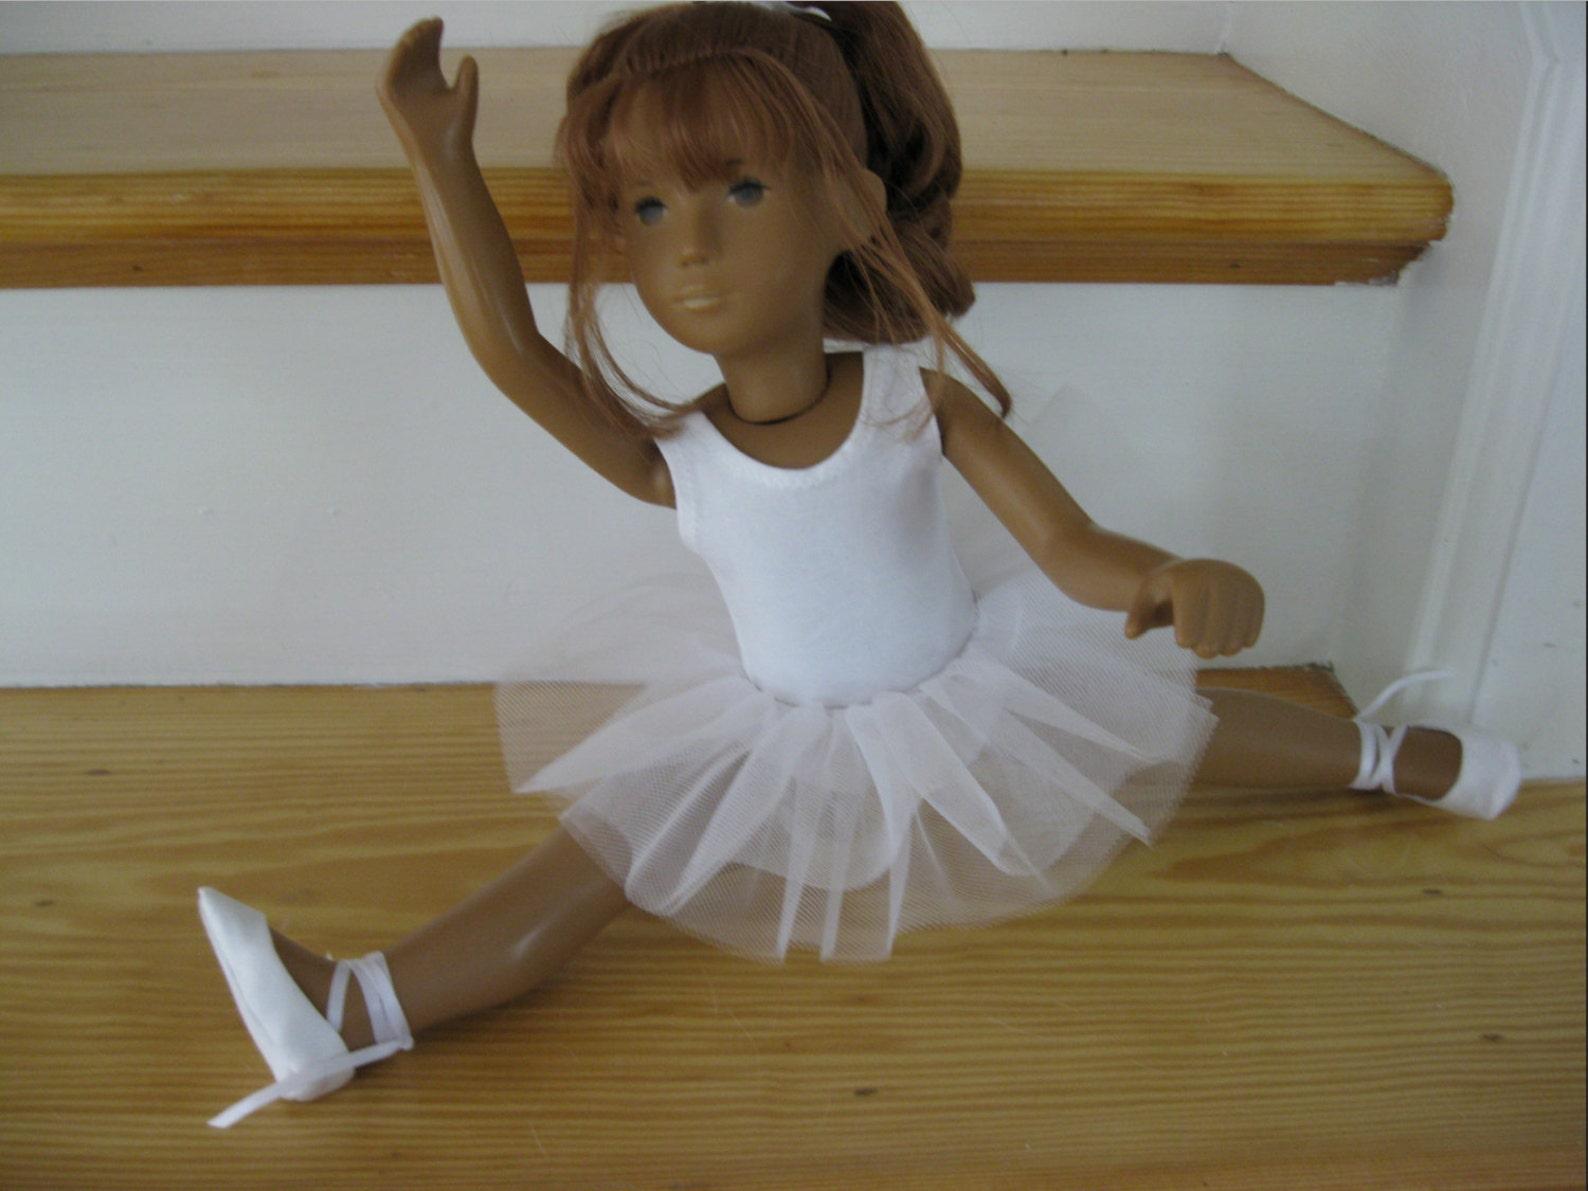 ballet tutu and leotard outfit for sasha girls sasha baby or sasha toddler doll ballet shoes optional